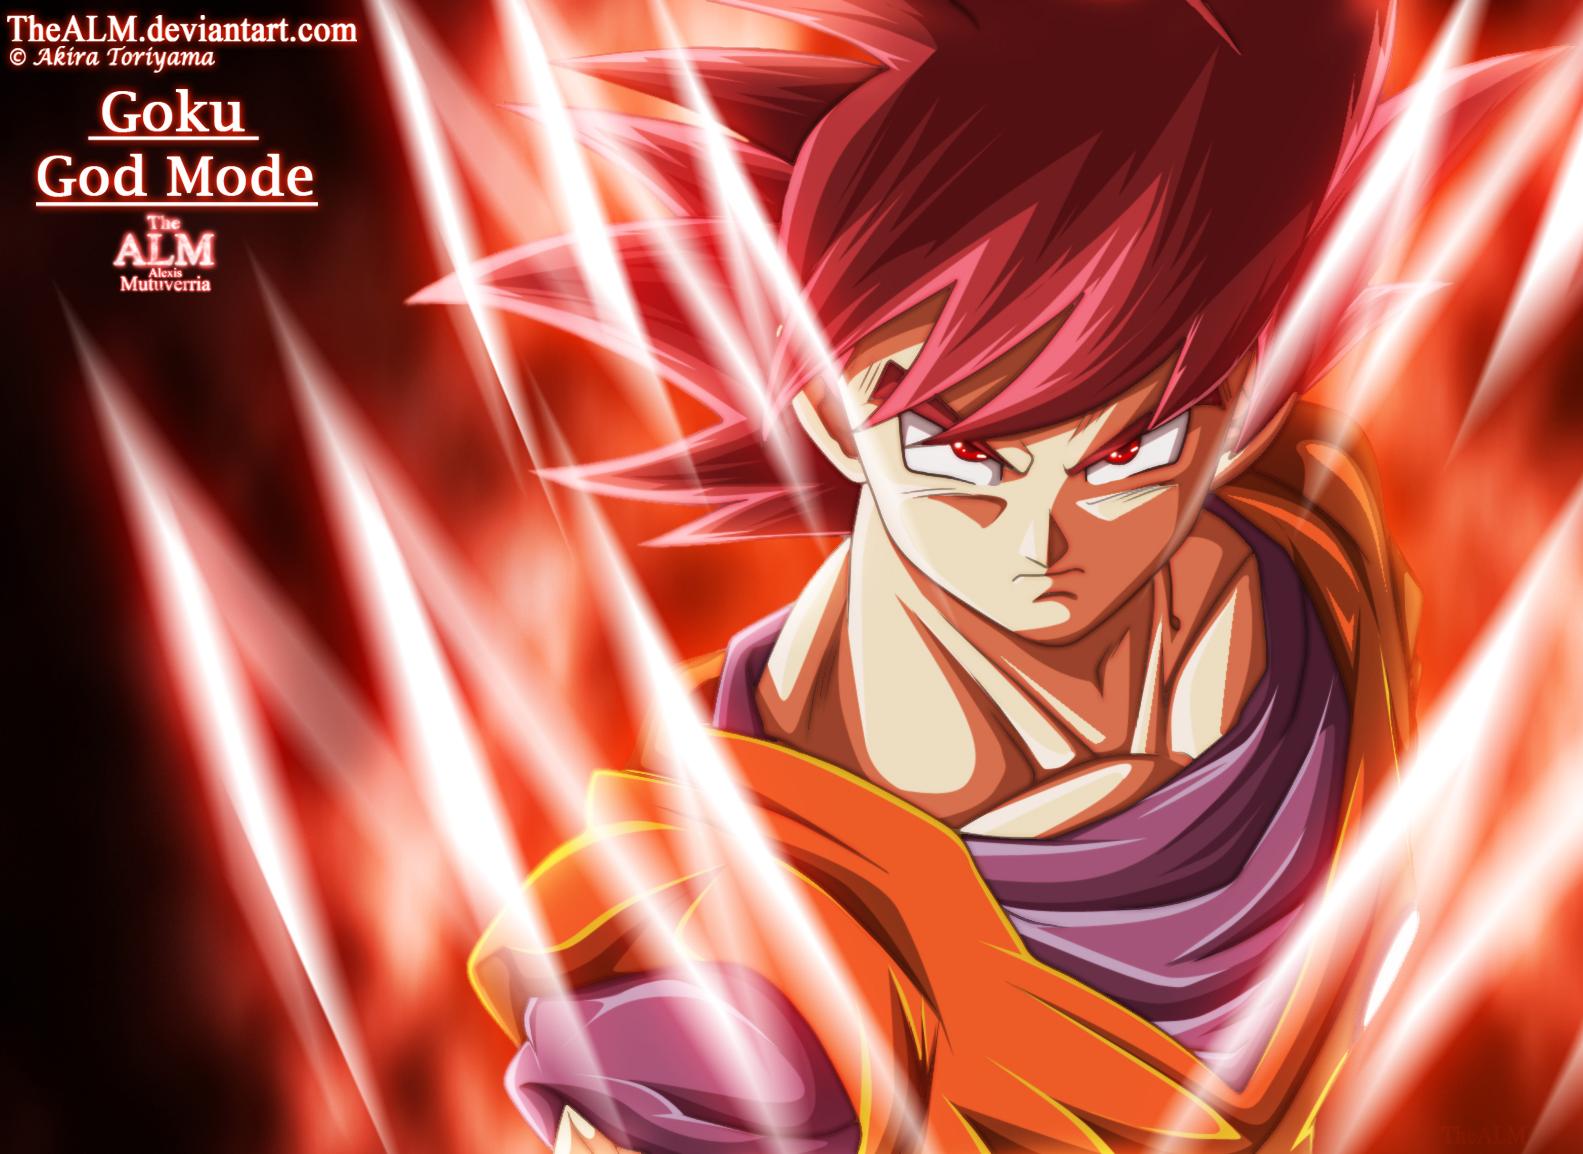 Dragon Ball Z Wallpaper Goku Super Saiyan God Hd Wallpaper Gallery